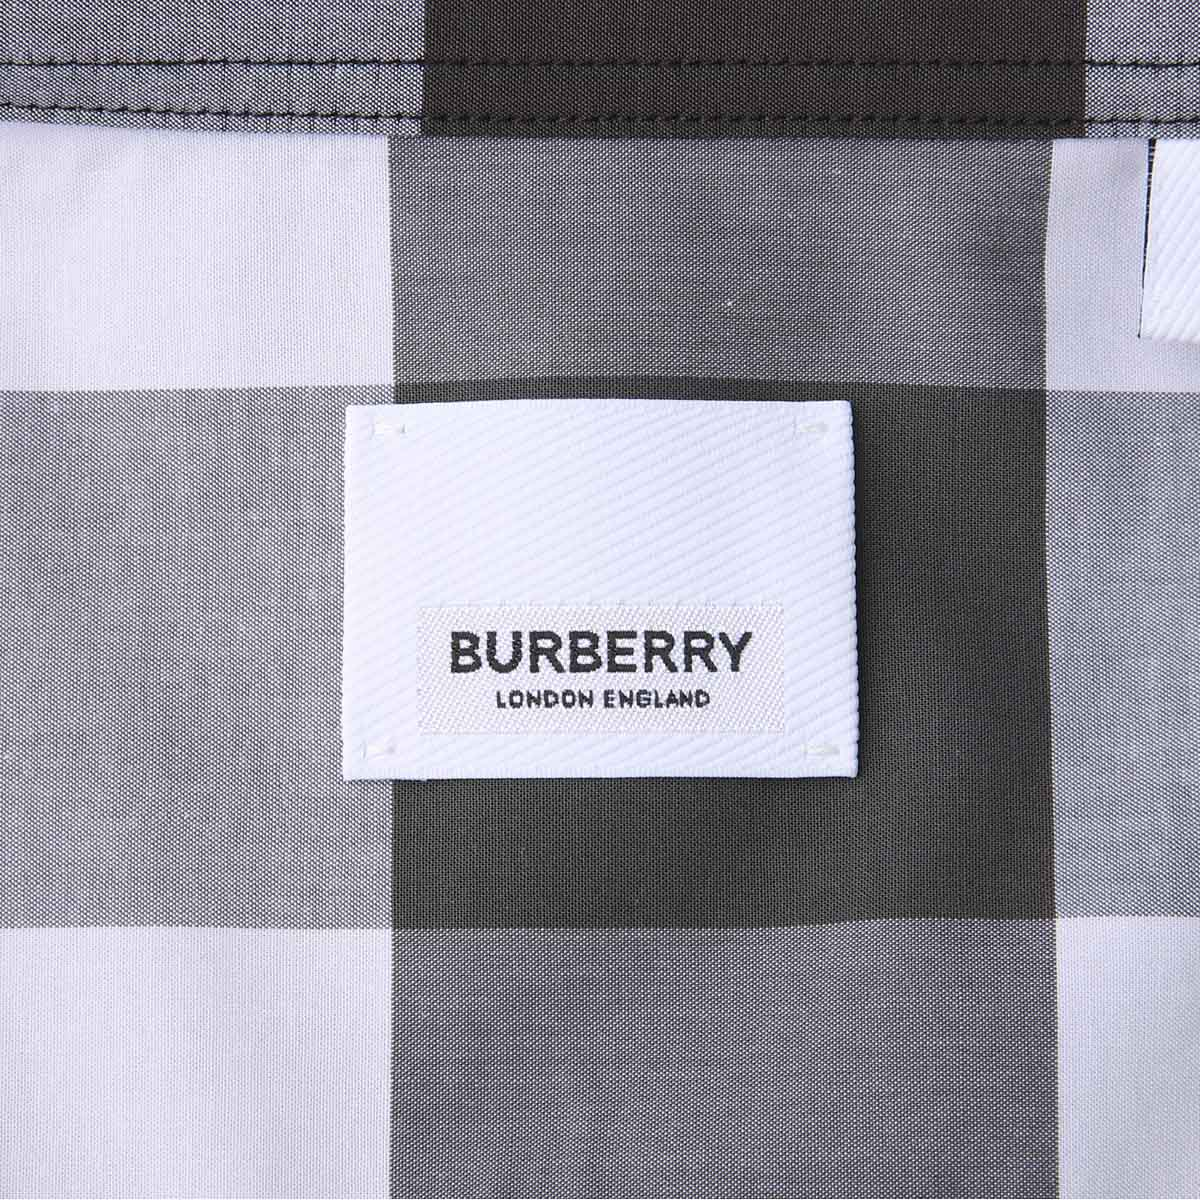 BURBERRY バーバリー 長袖 シャツ/SOMERTON メンズ